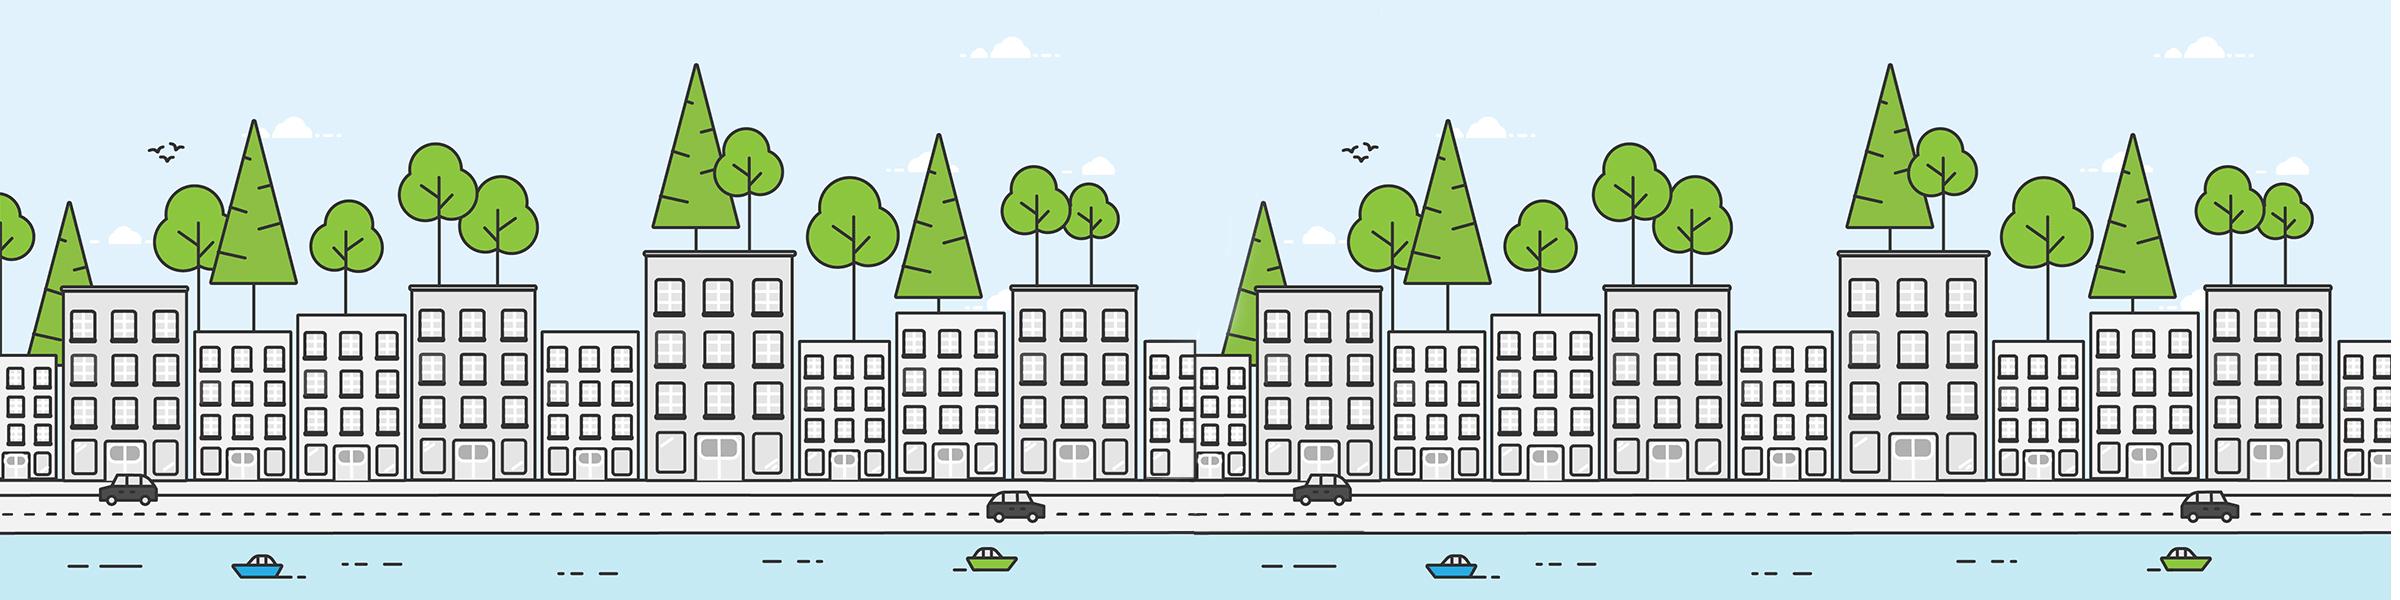 City Trees Header